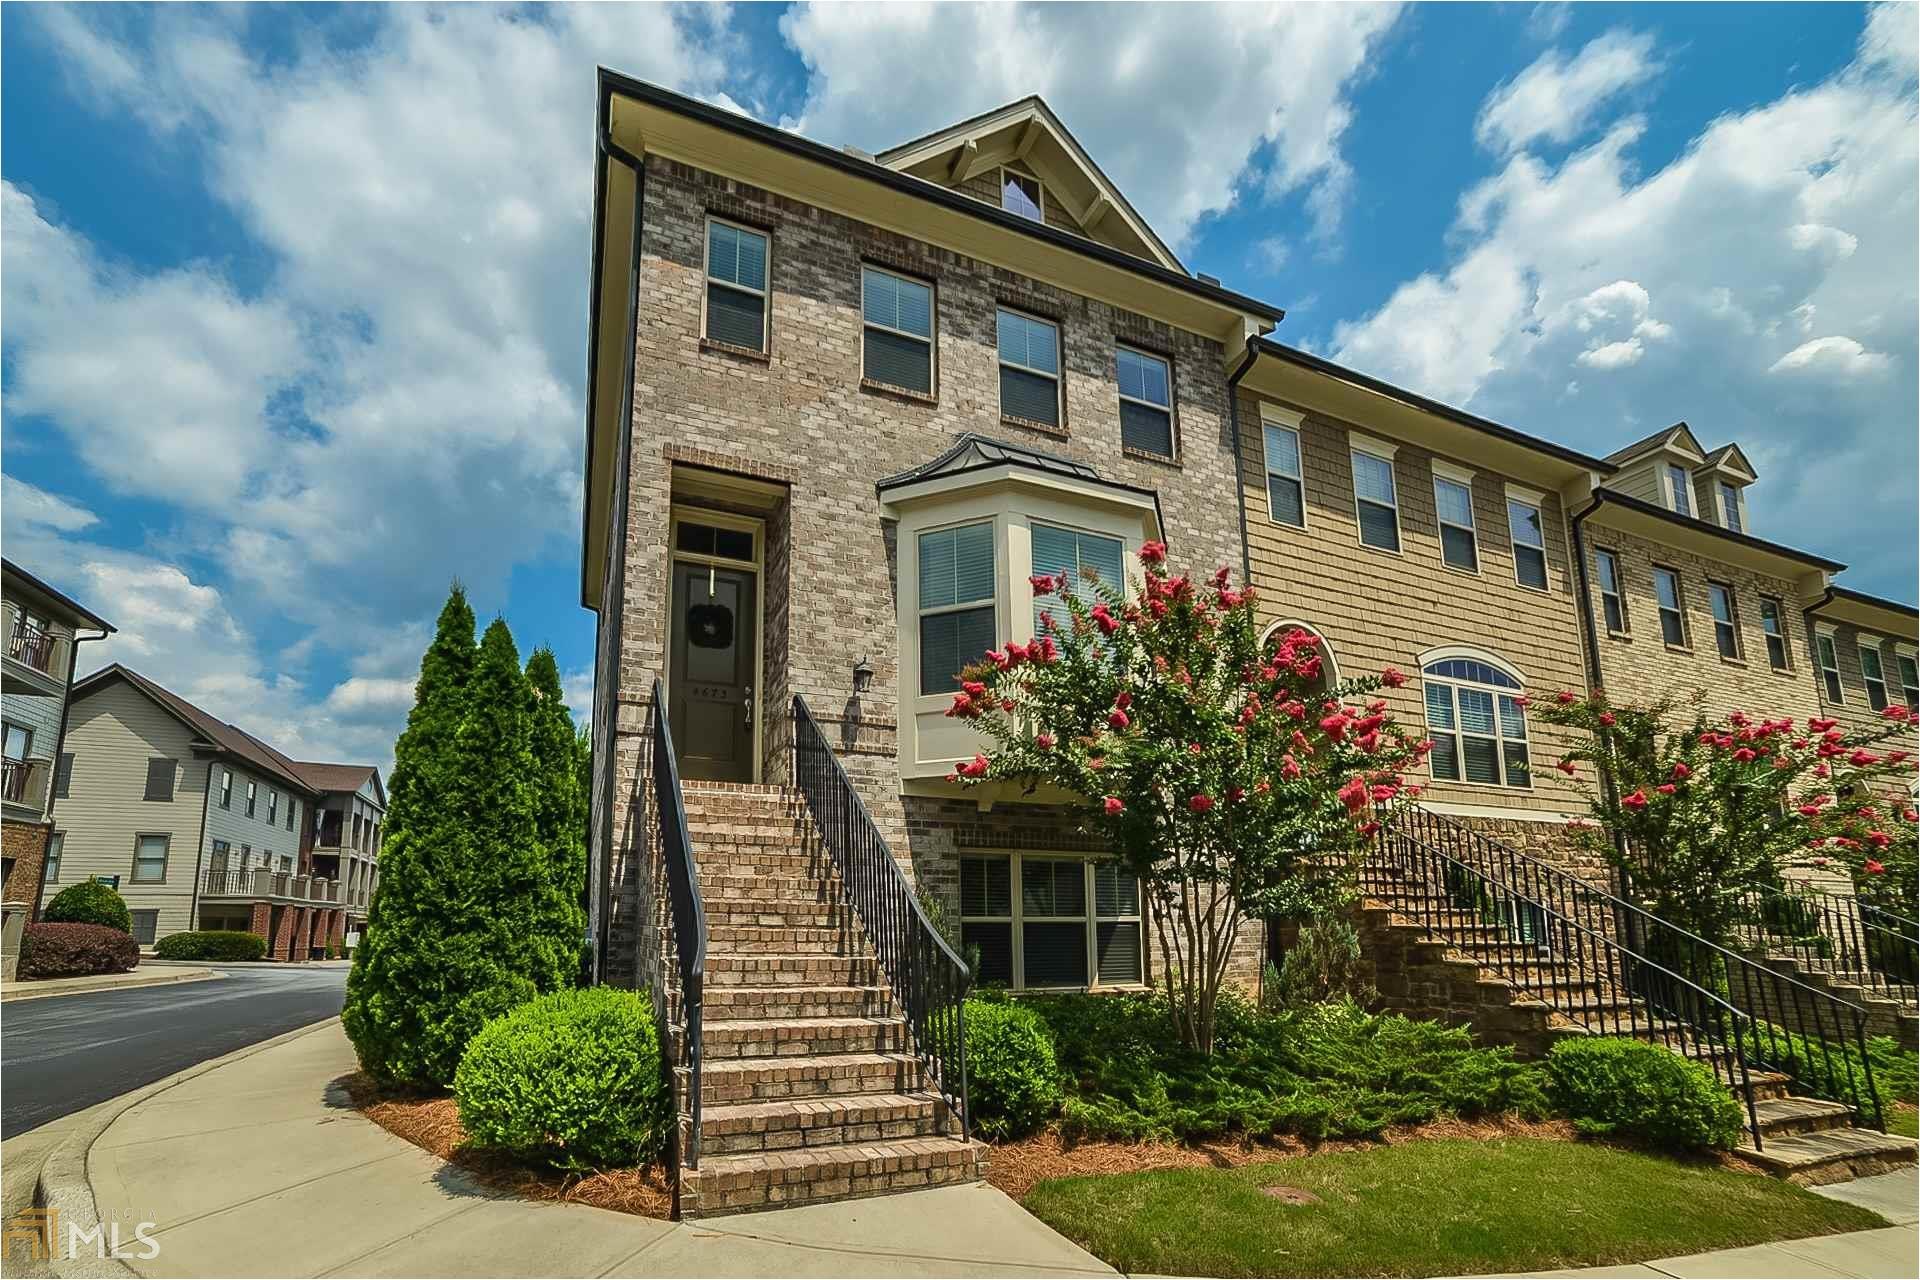 4673 pine st se smyrna ga 30080 6925 real estate listing for sale intown area homes